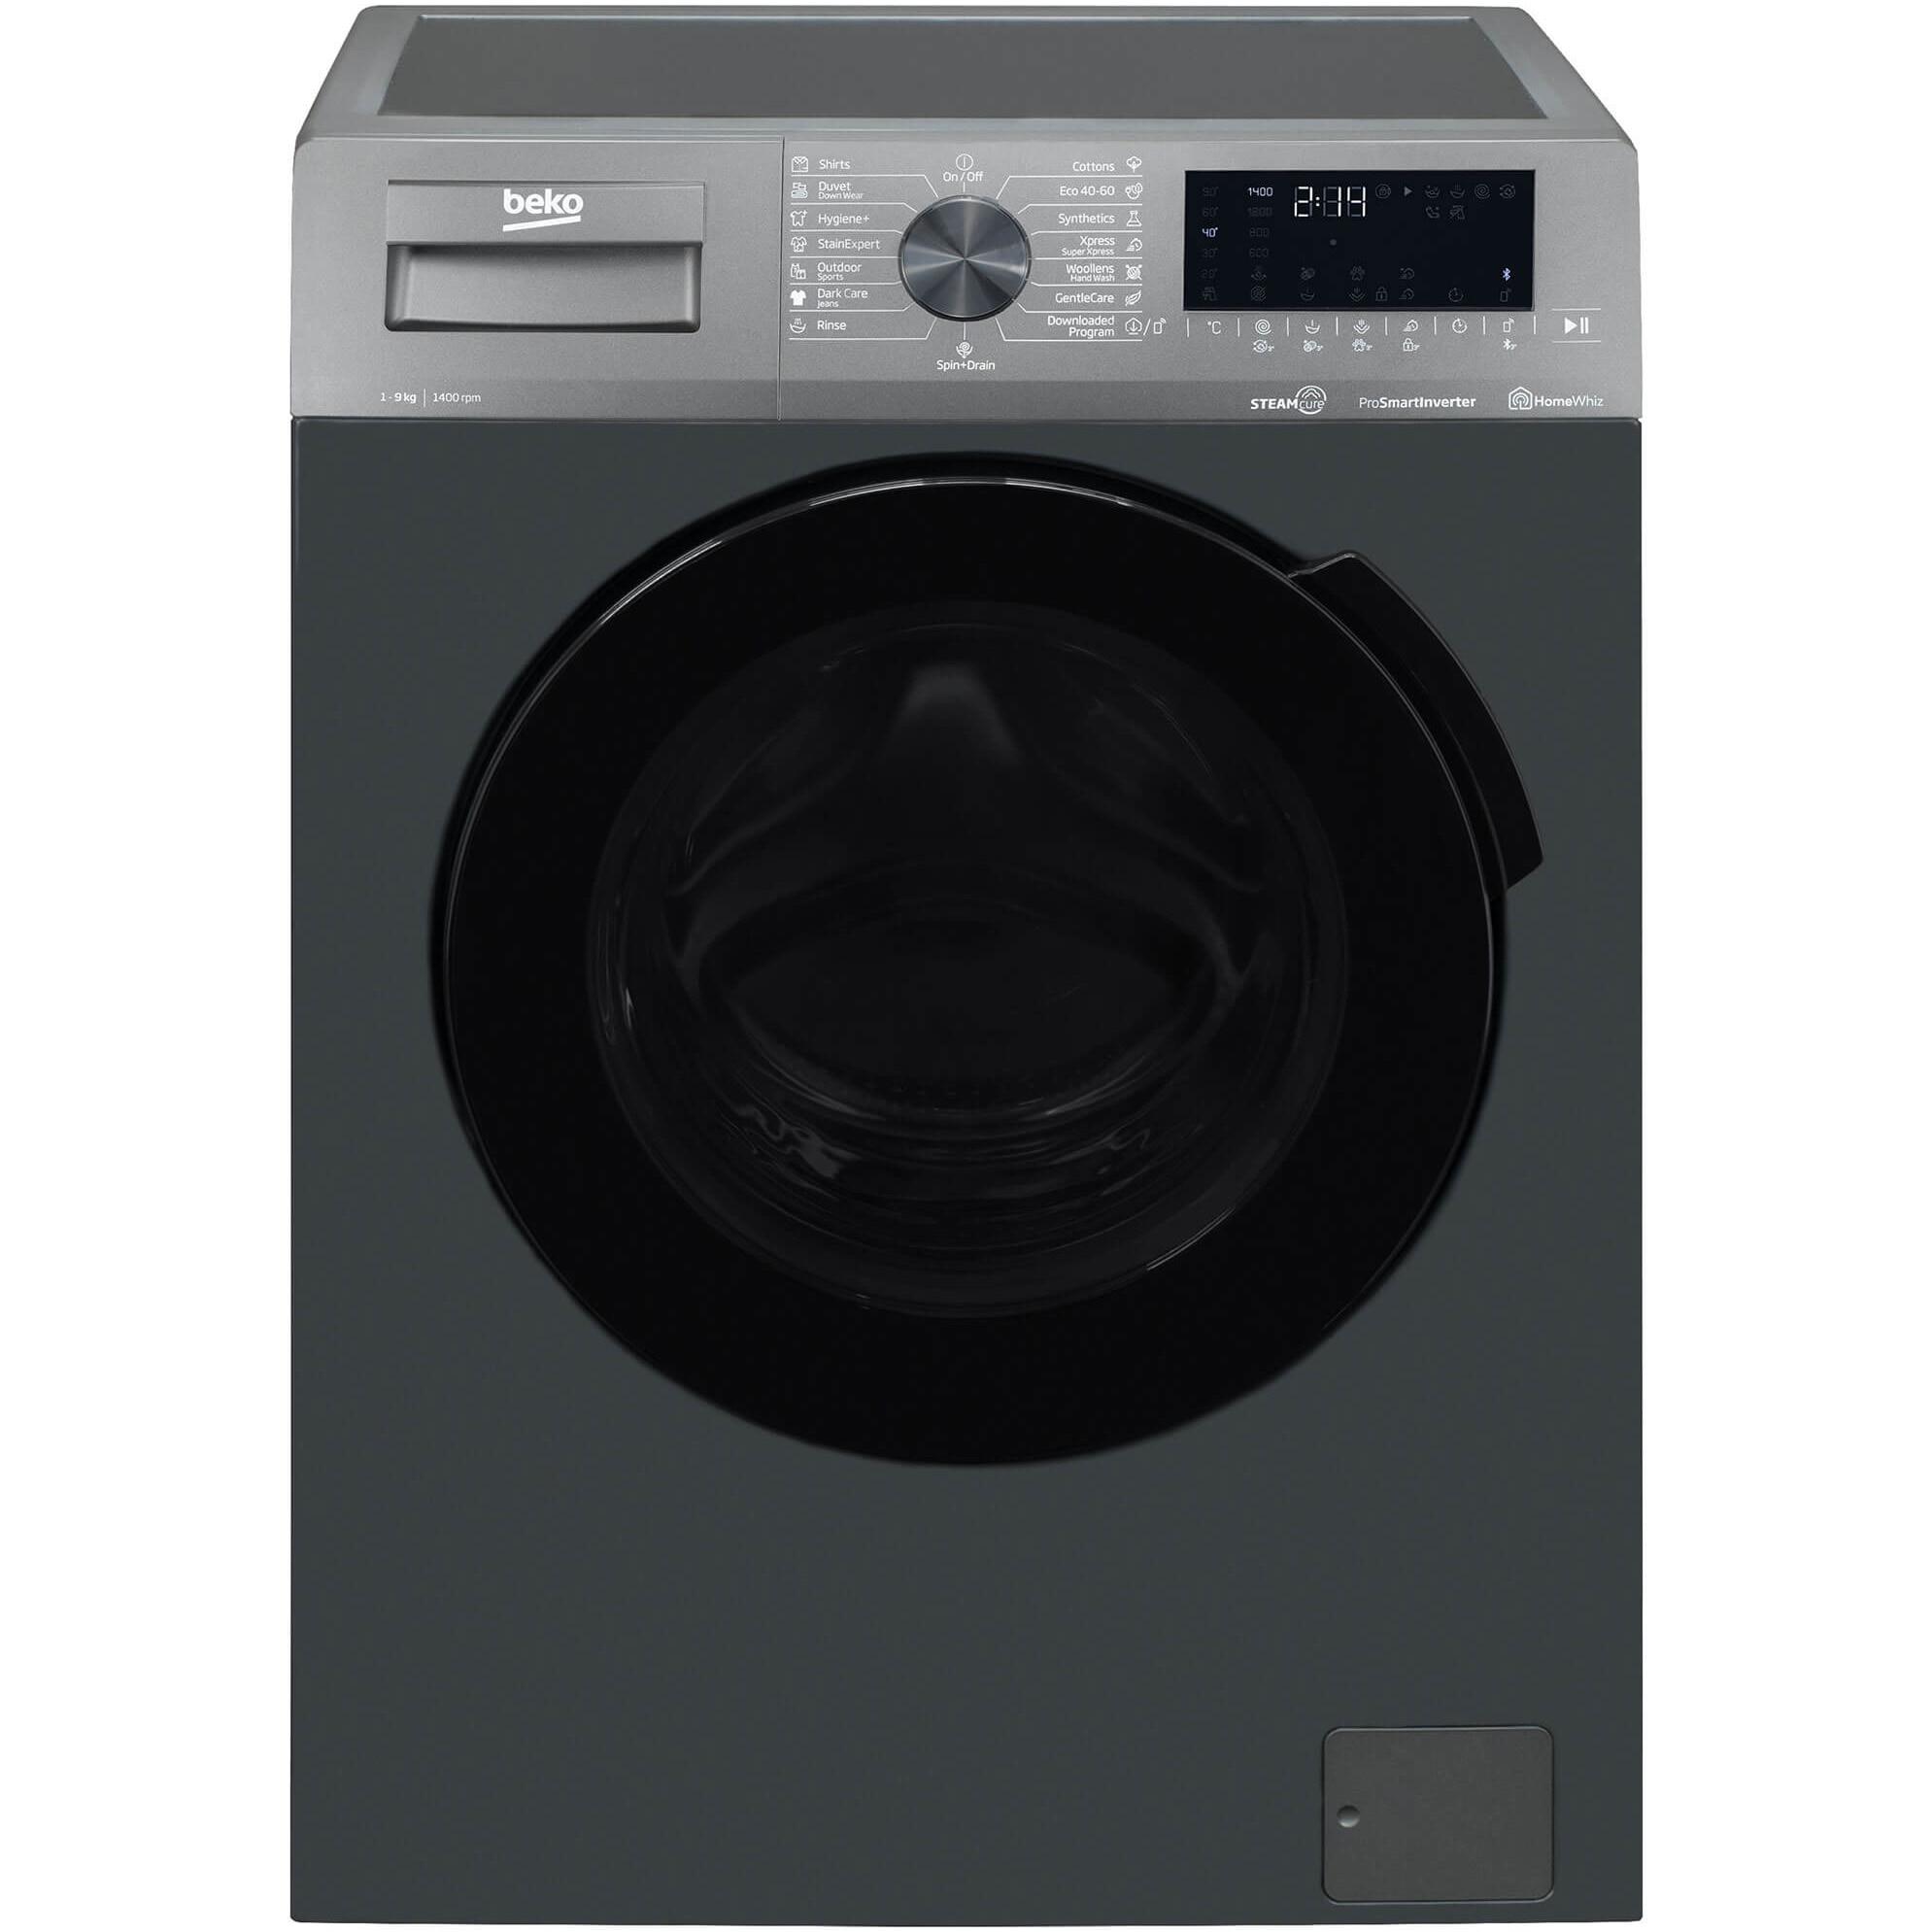 Fotografie Masina de spalat rufe Beko WUV9726XBA, 9 kg, 1400 RPM, Clasa C, Motor ProSmart Inverter, Hygiene+ cu SteamCure, AddXtra, Antracit